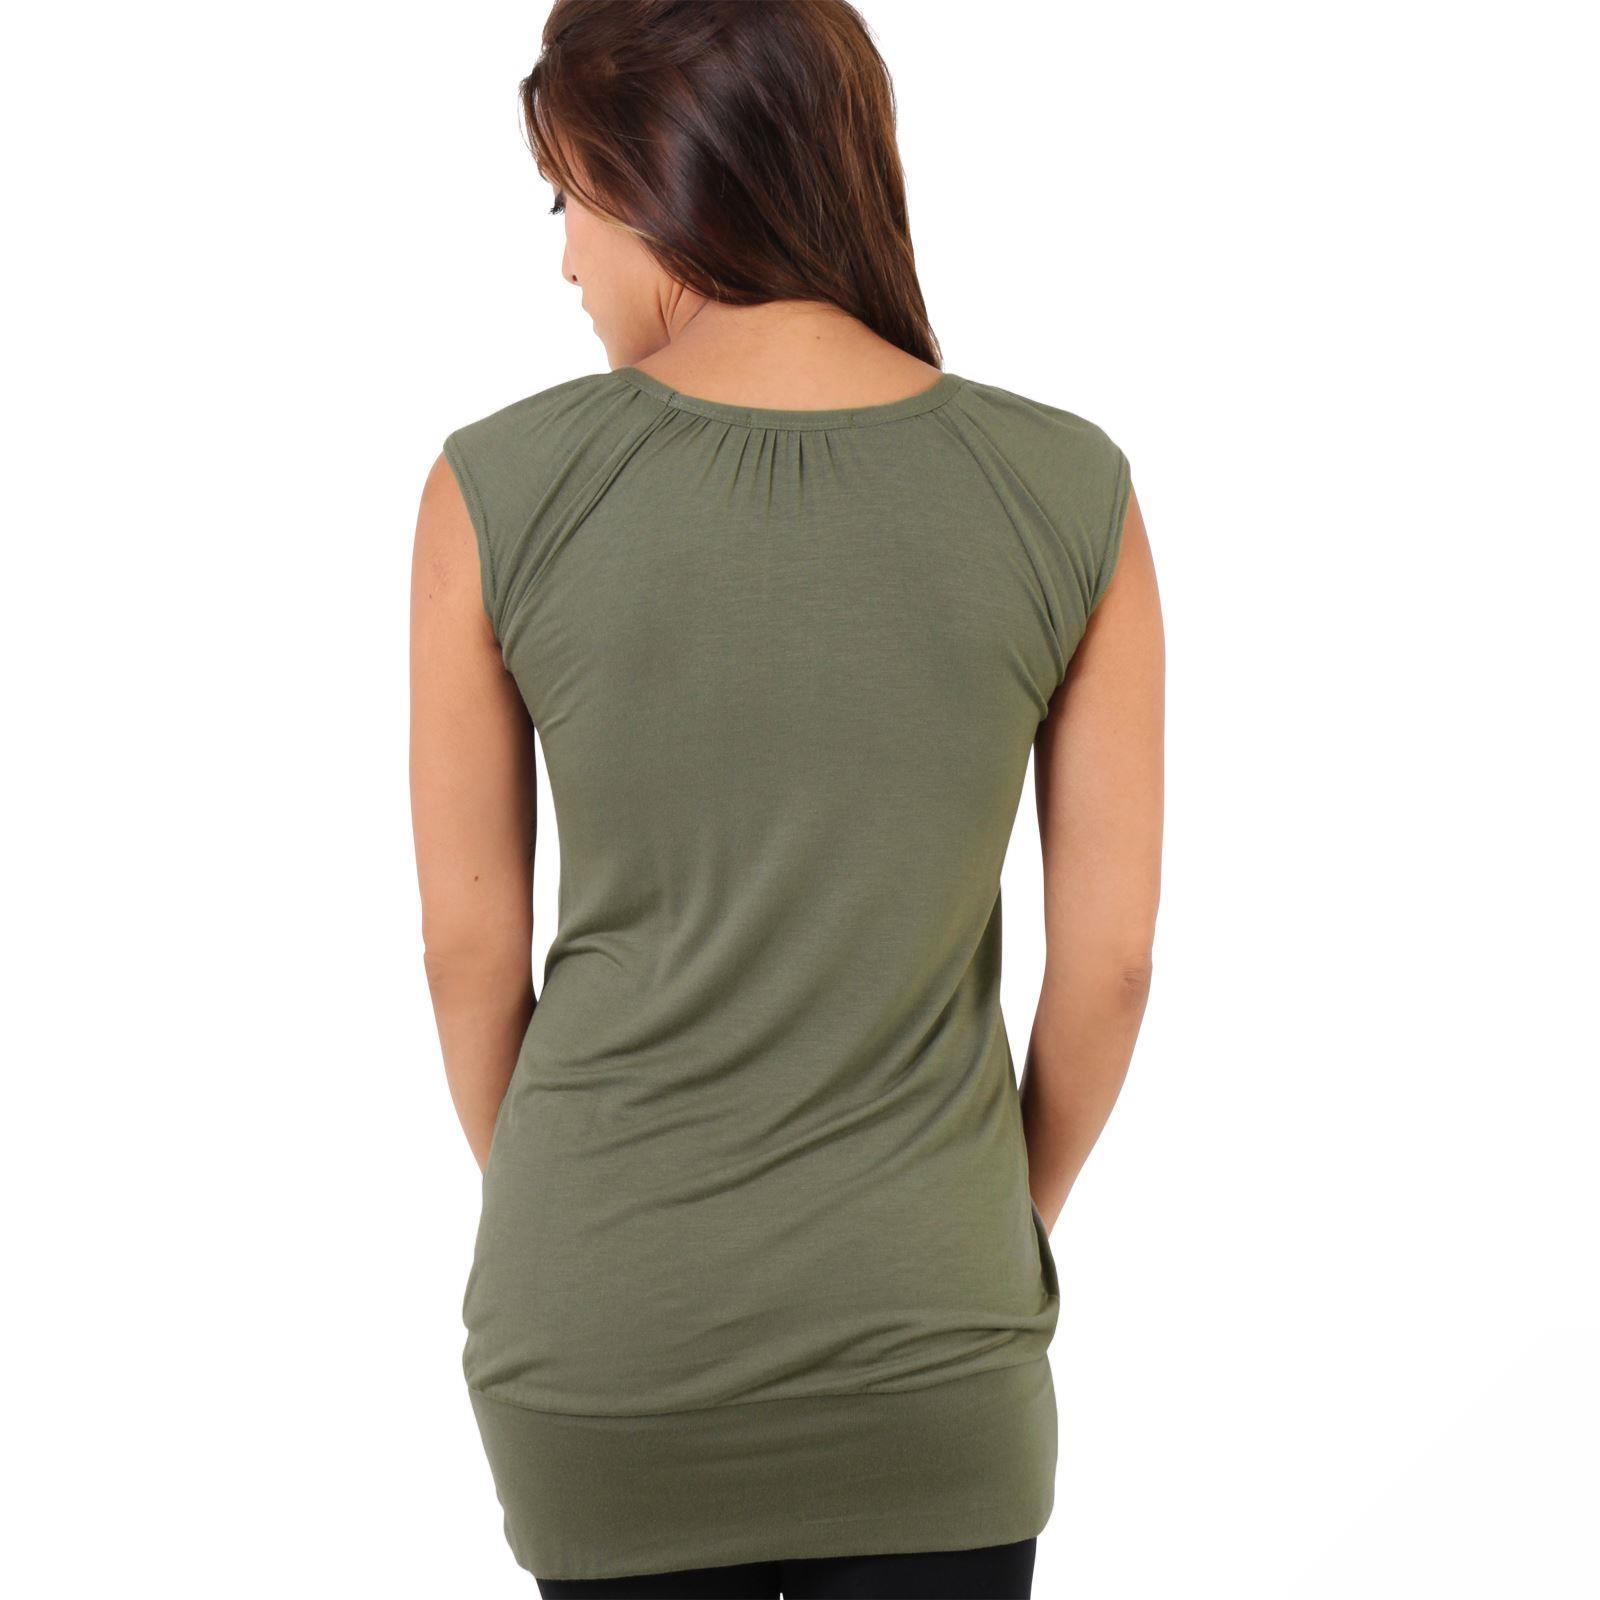 Womens-Ladies-Plain-T-Shirt-Short-Sleeve-Long-Loose-V-Neck-Blouse-Tunic-Top thumbnail 26